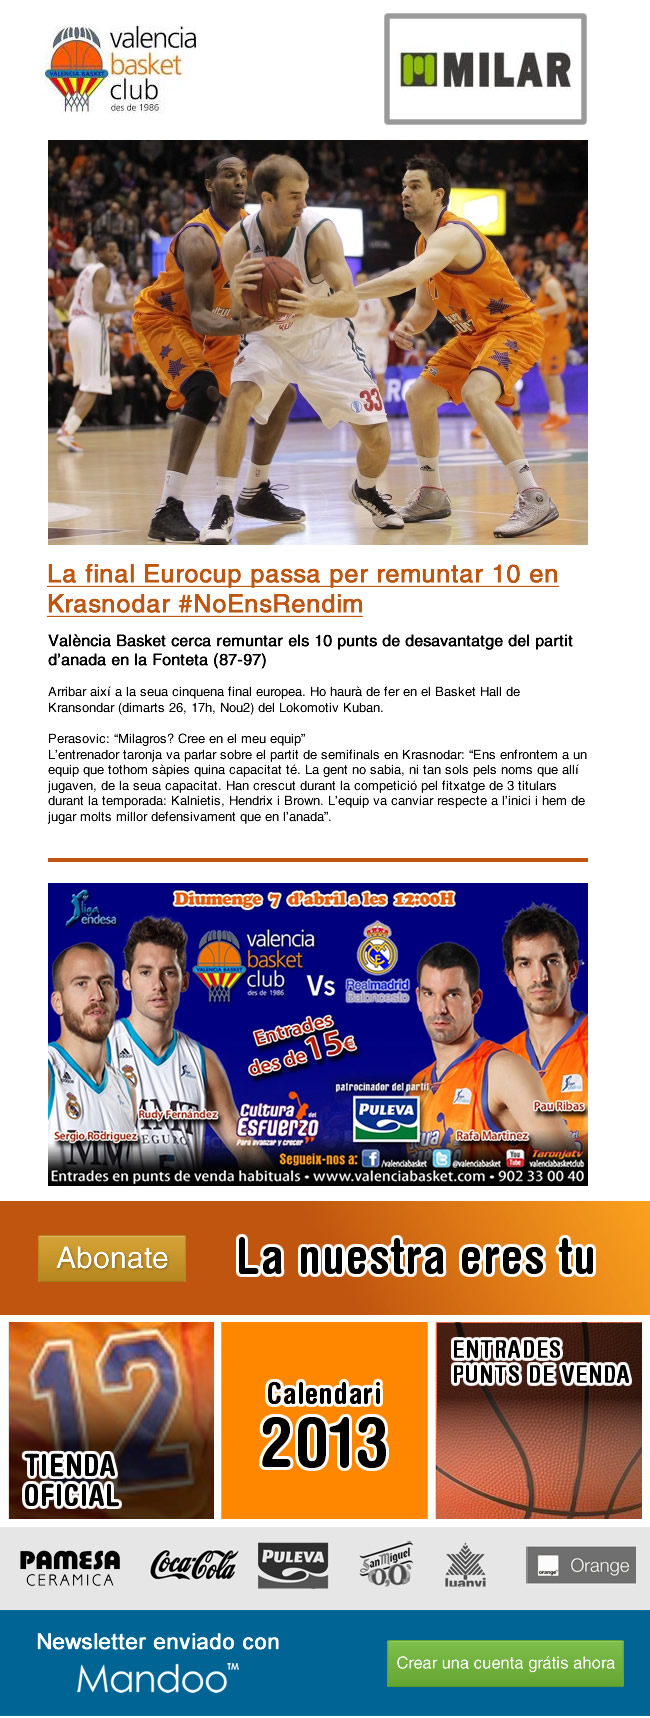 Diseño de newsletter para Valencia Basket